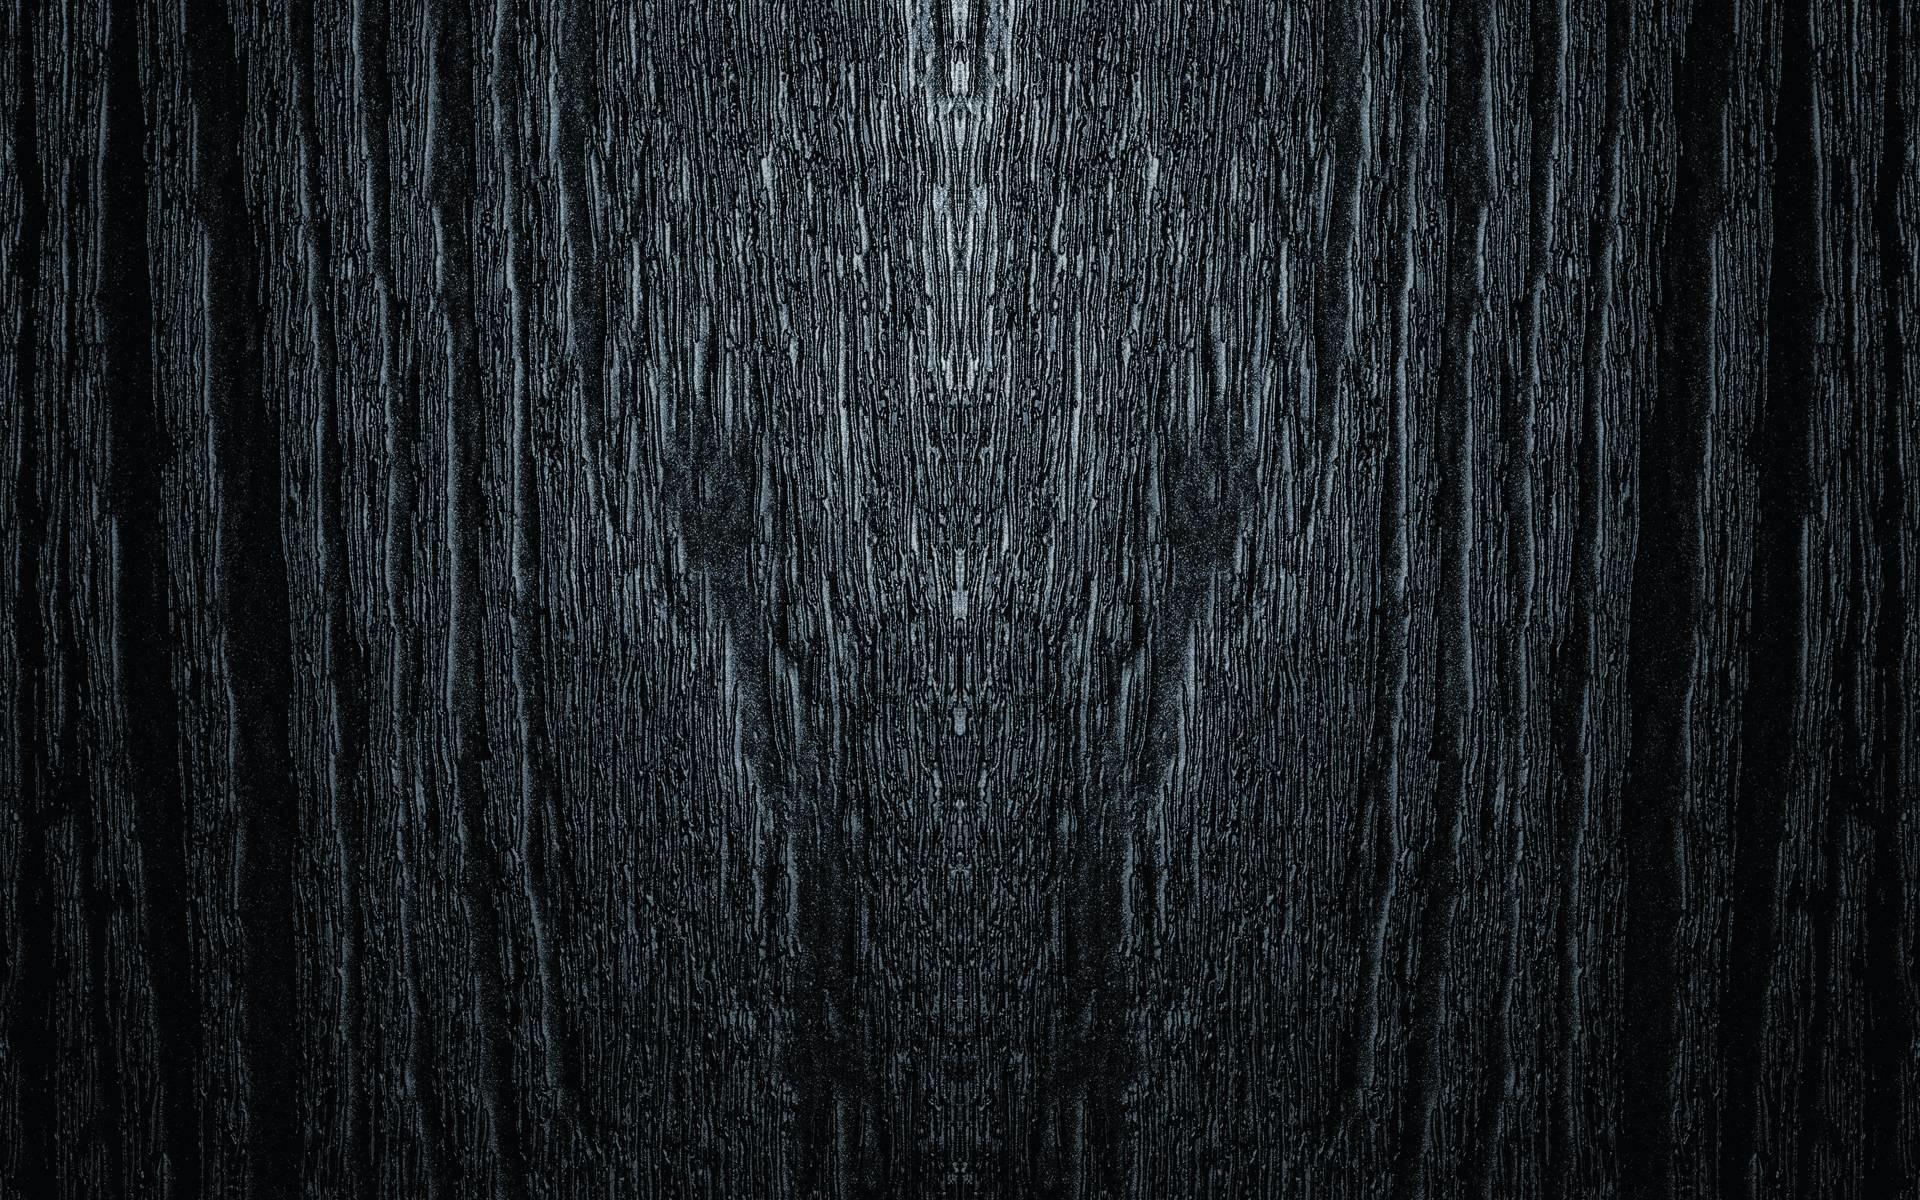 imvu wallpaper